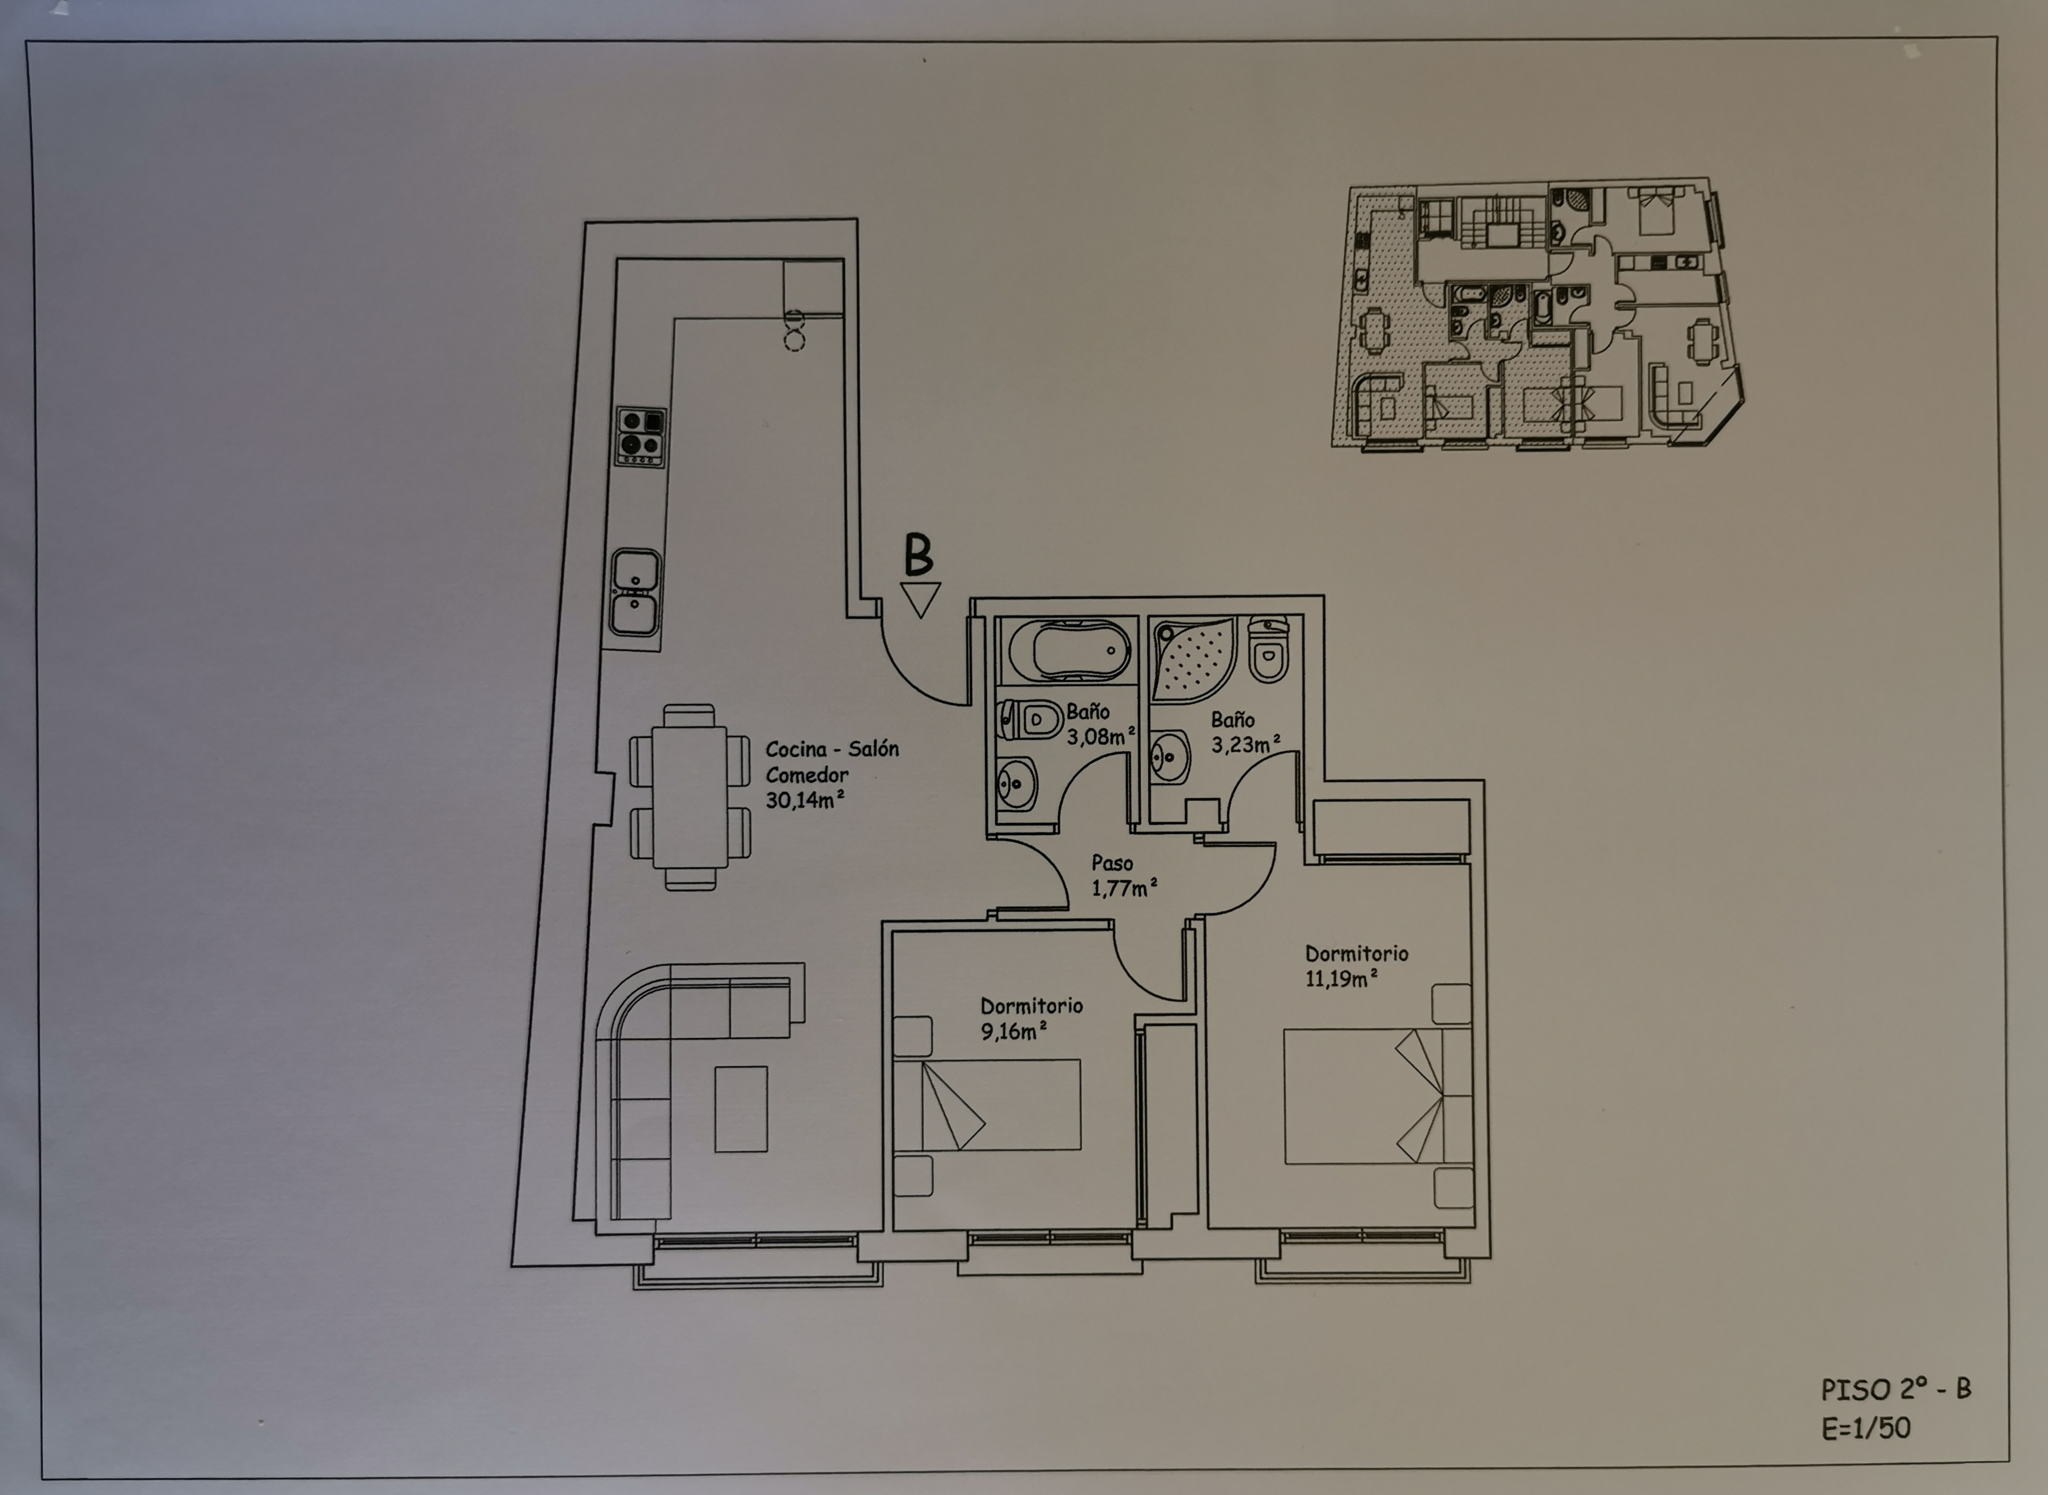 plano piso sanxenxo portonovo 2B